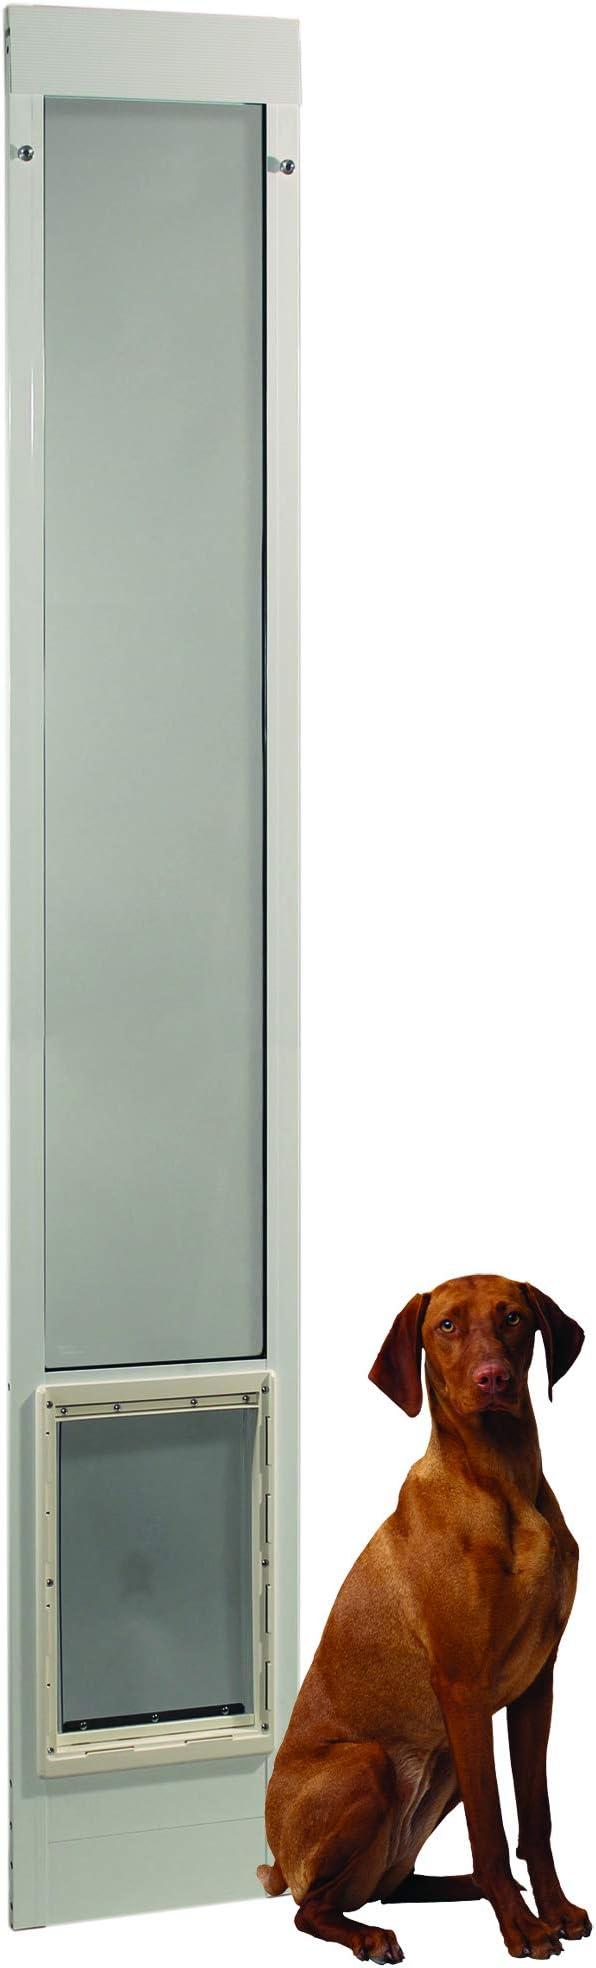 Pet Supplies Dog Doors Flaps Extra Large Dog Pet Door Patio Flap Aluminum Sliding Glass Slider Insert 10 5x15